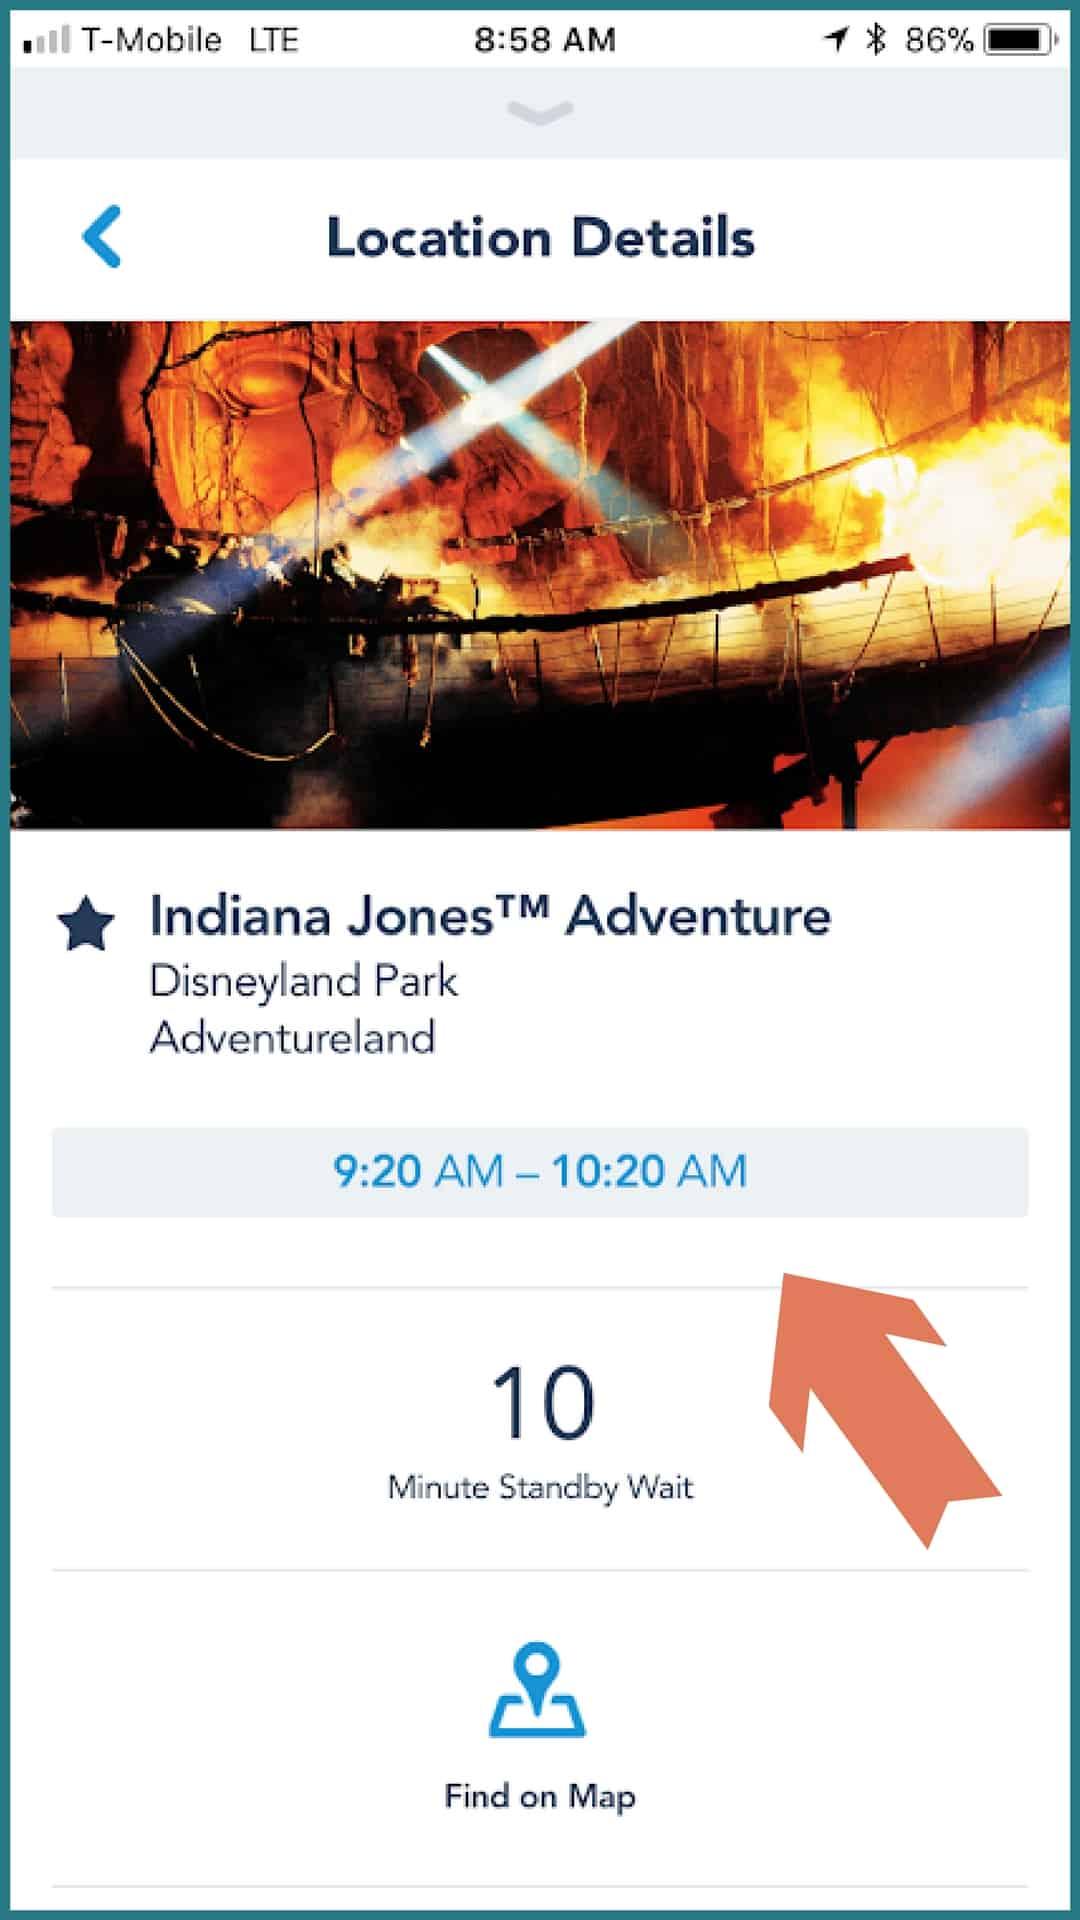 Disney MaxPass Indiana Jones Adventure